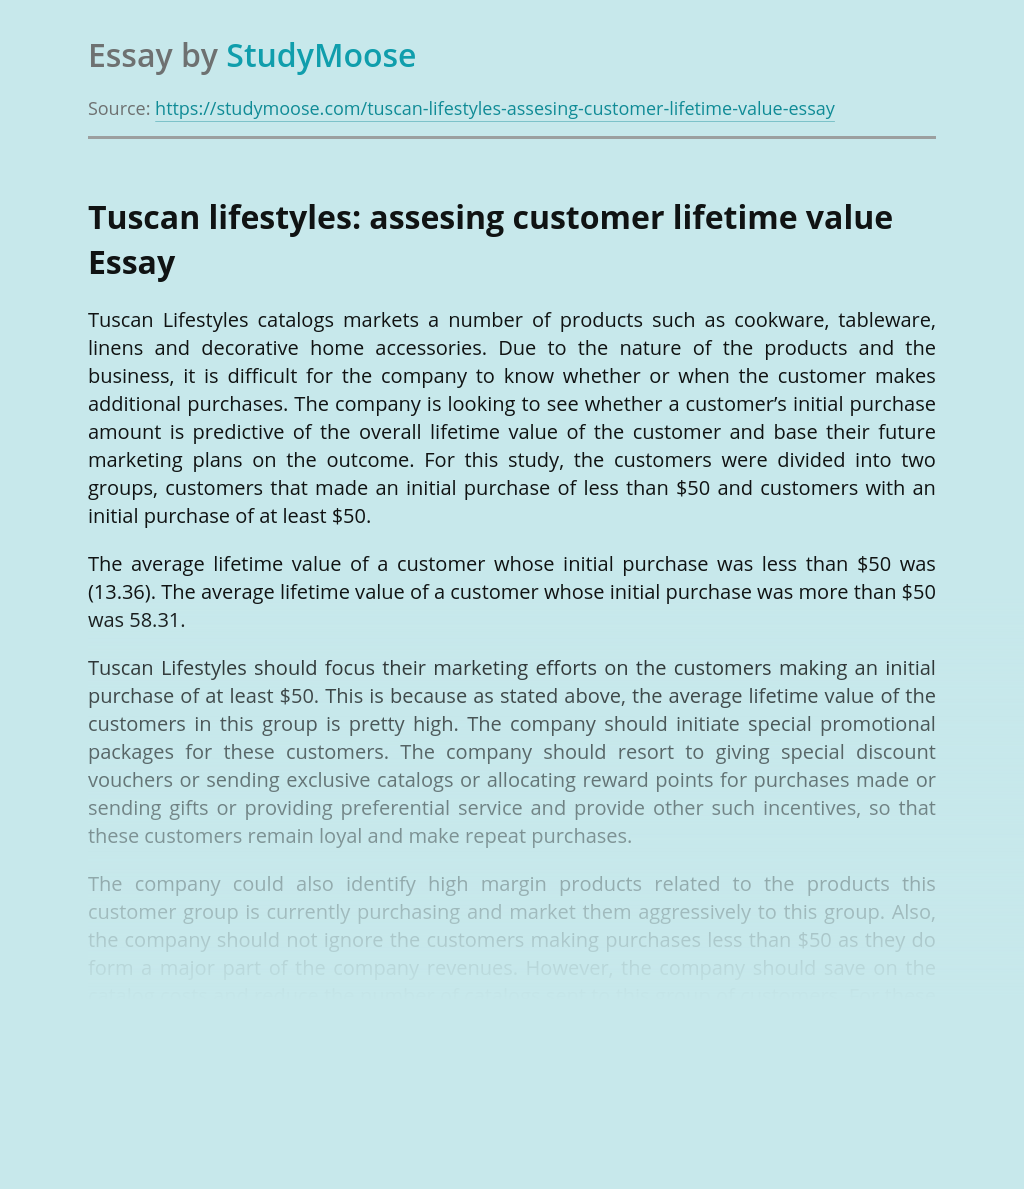 Tuscan lifestyles: assesing customer lifetime value